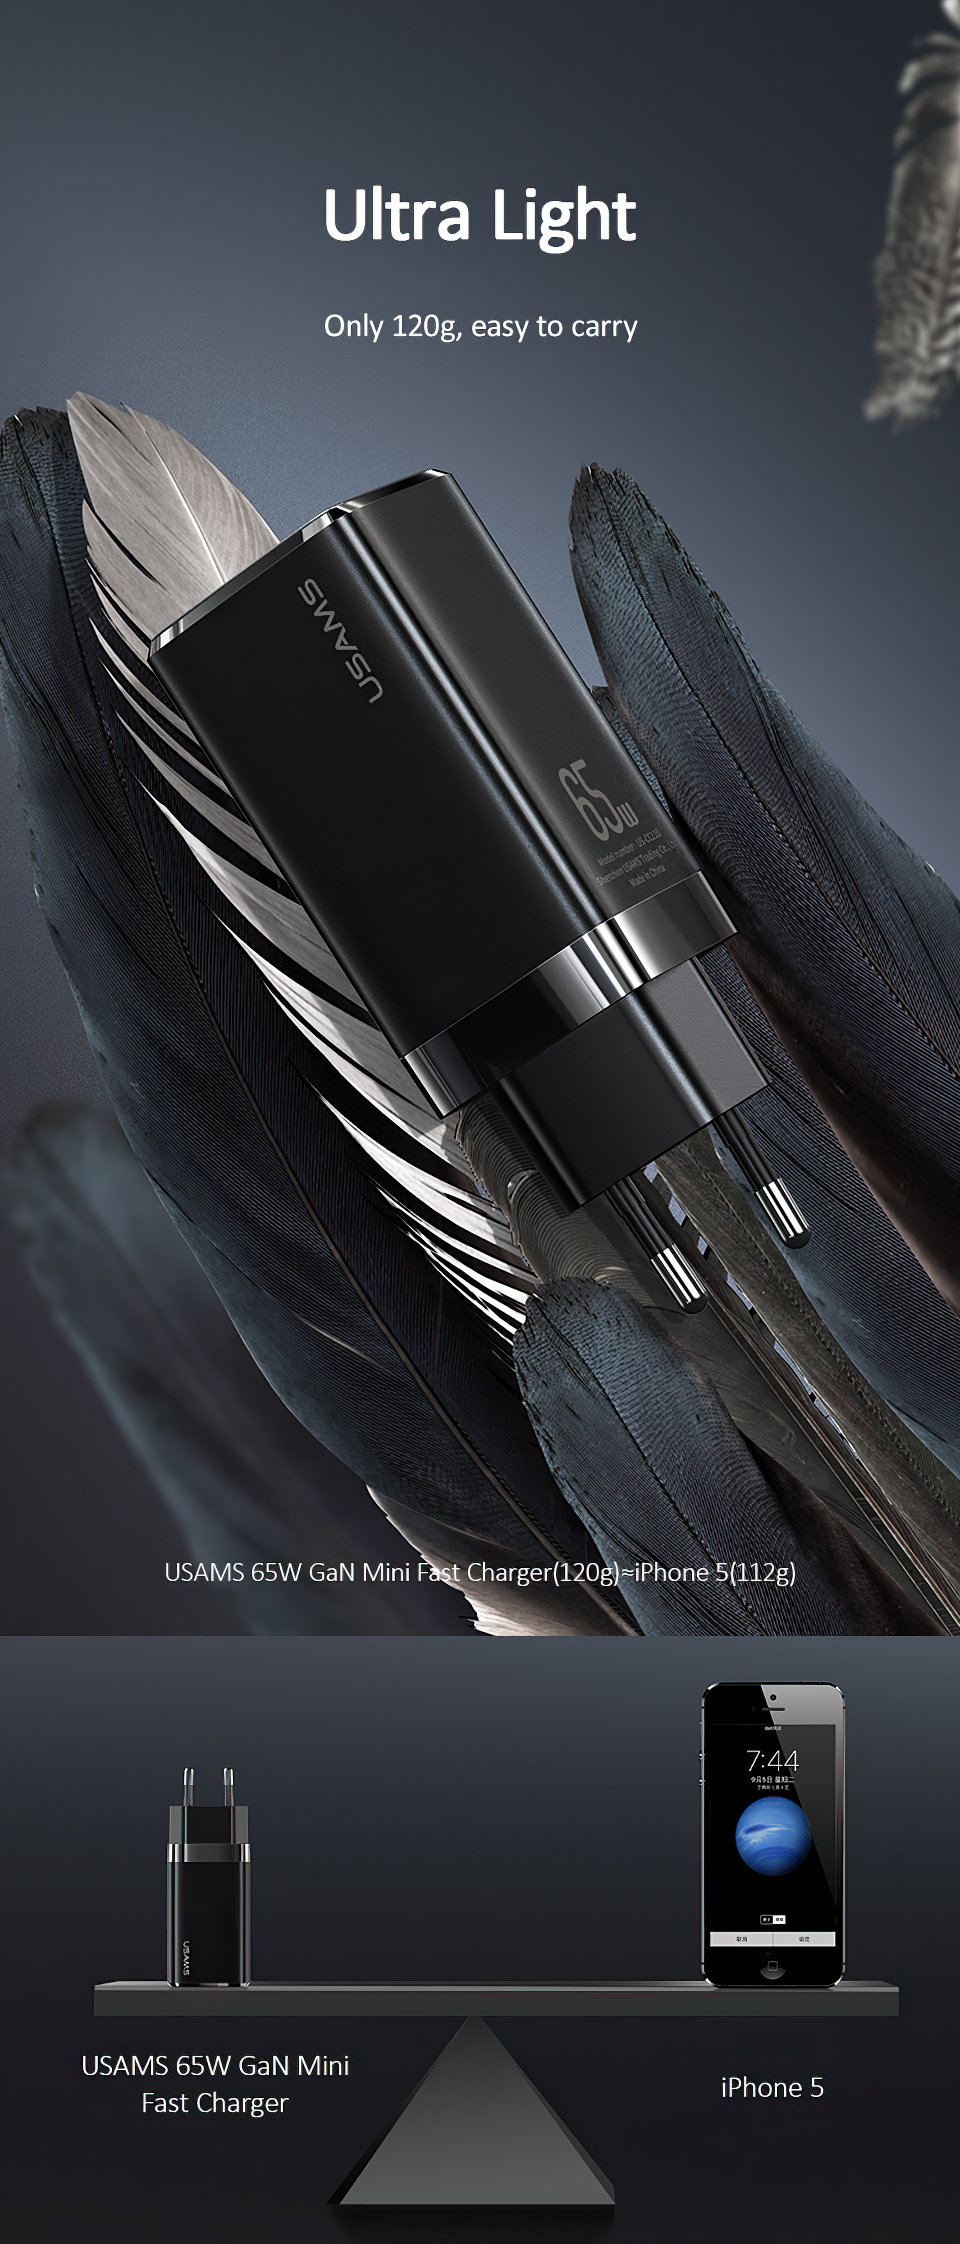 US-CC110-T33-氮化镓充电器-欧规_08-width-960px